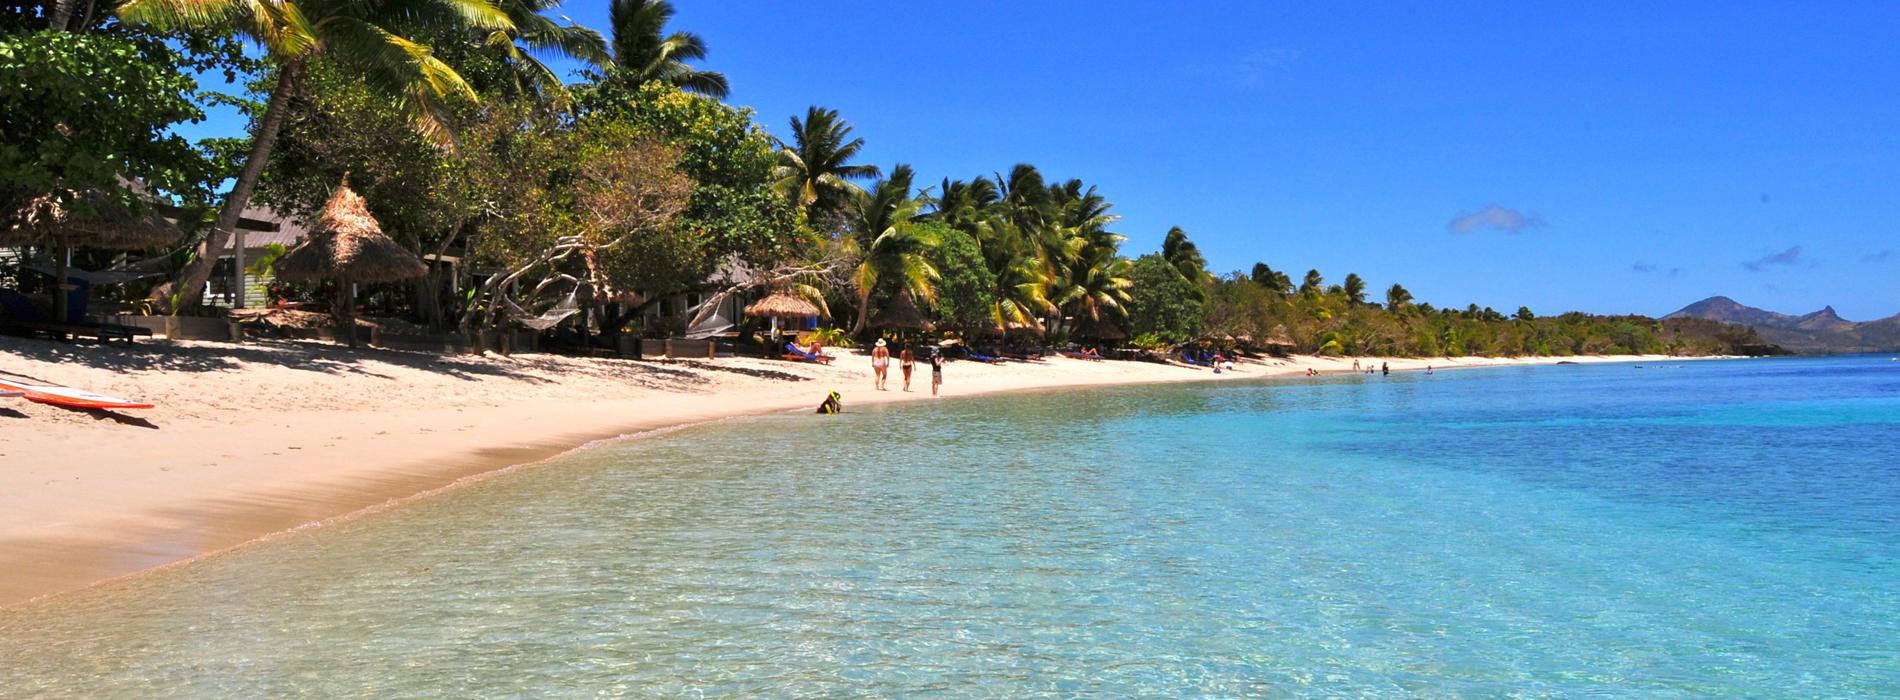 blue lagoon resort fiji